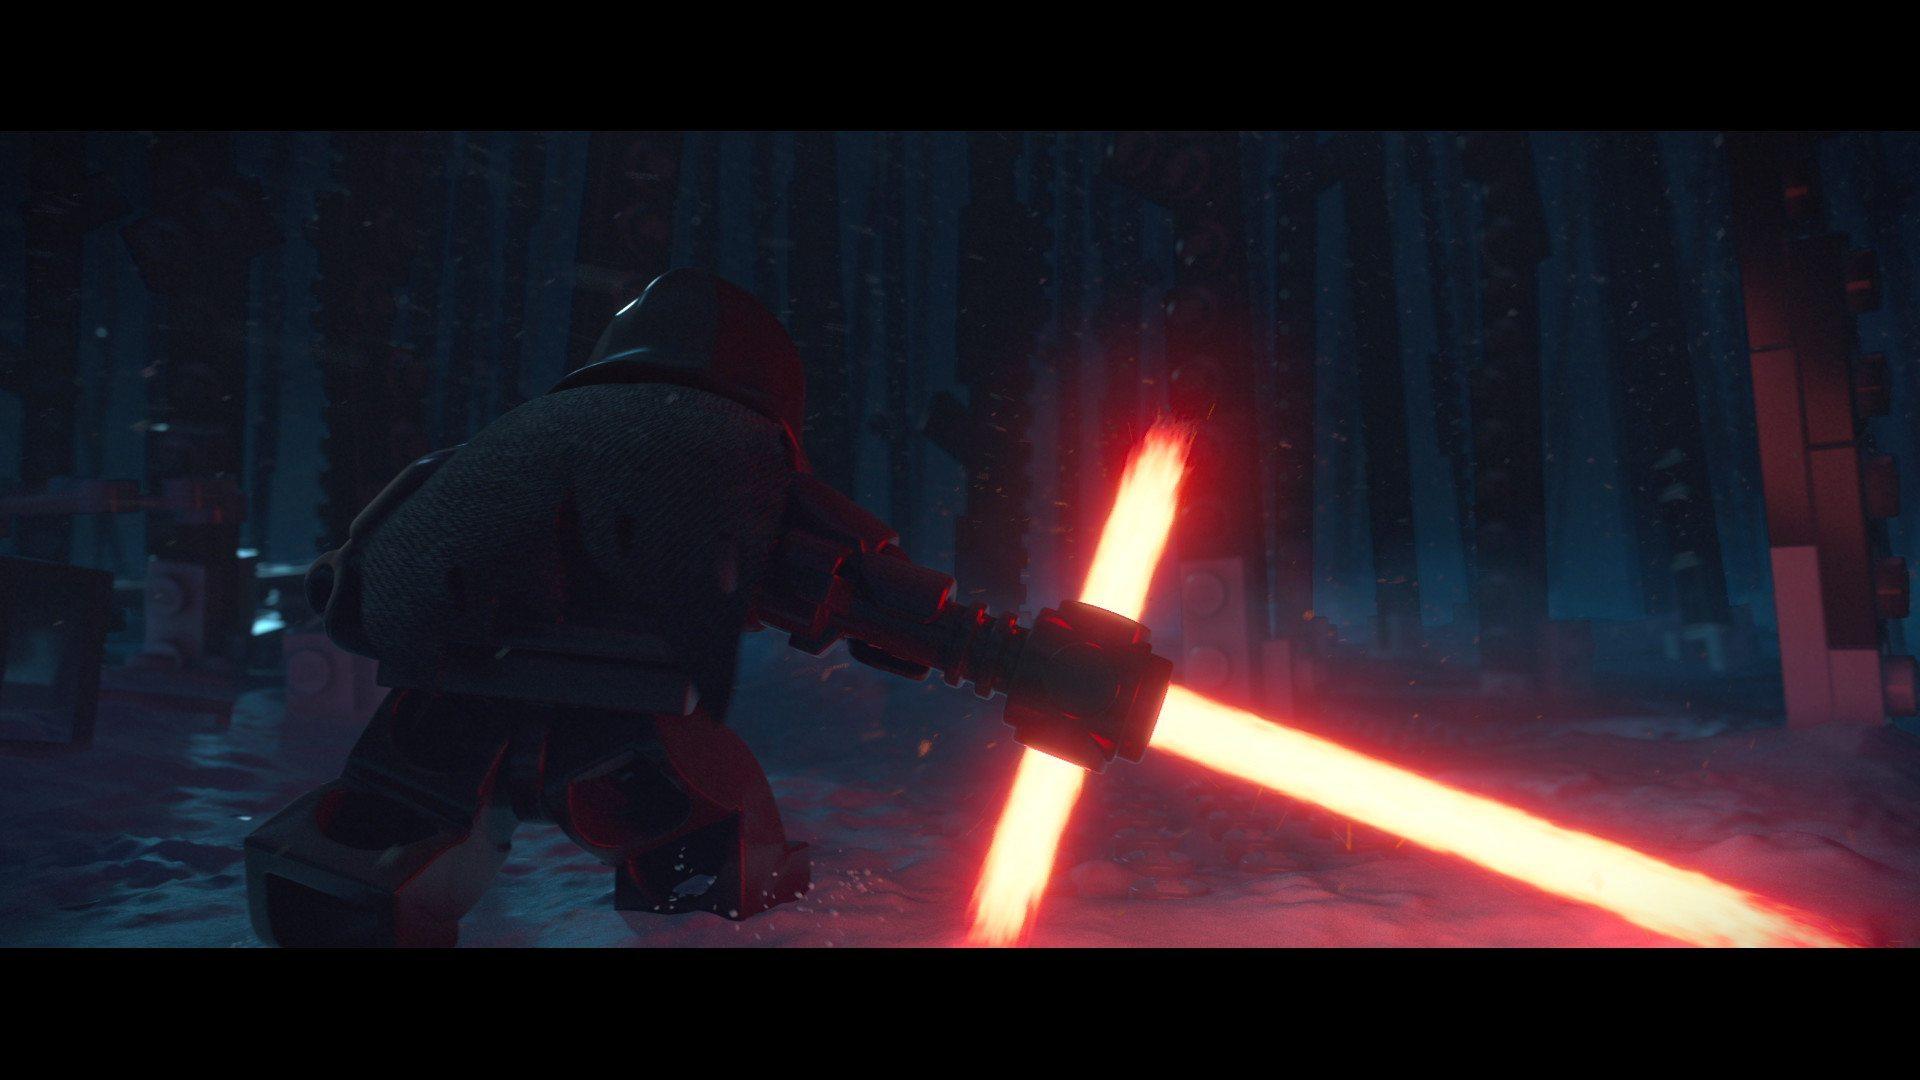 Star-wars-lego-force-awakens-bagogames